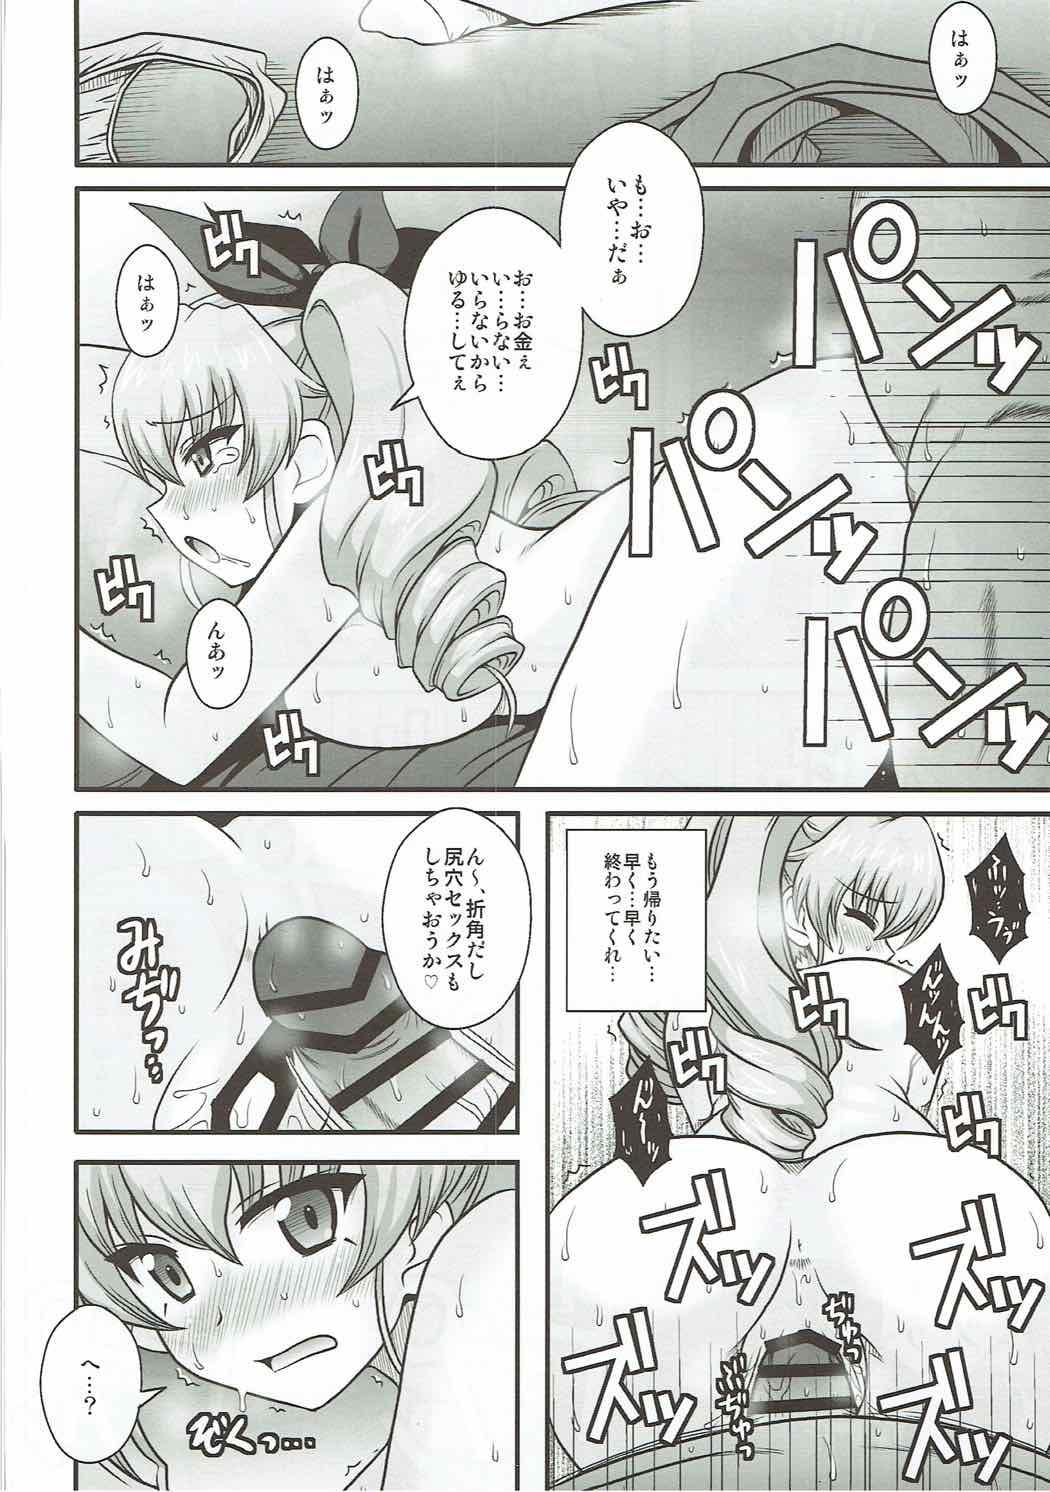 Anzio Enkou Chiyomi 17-sai 20